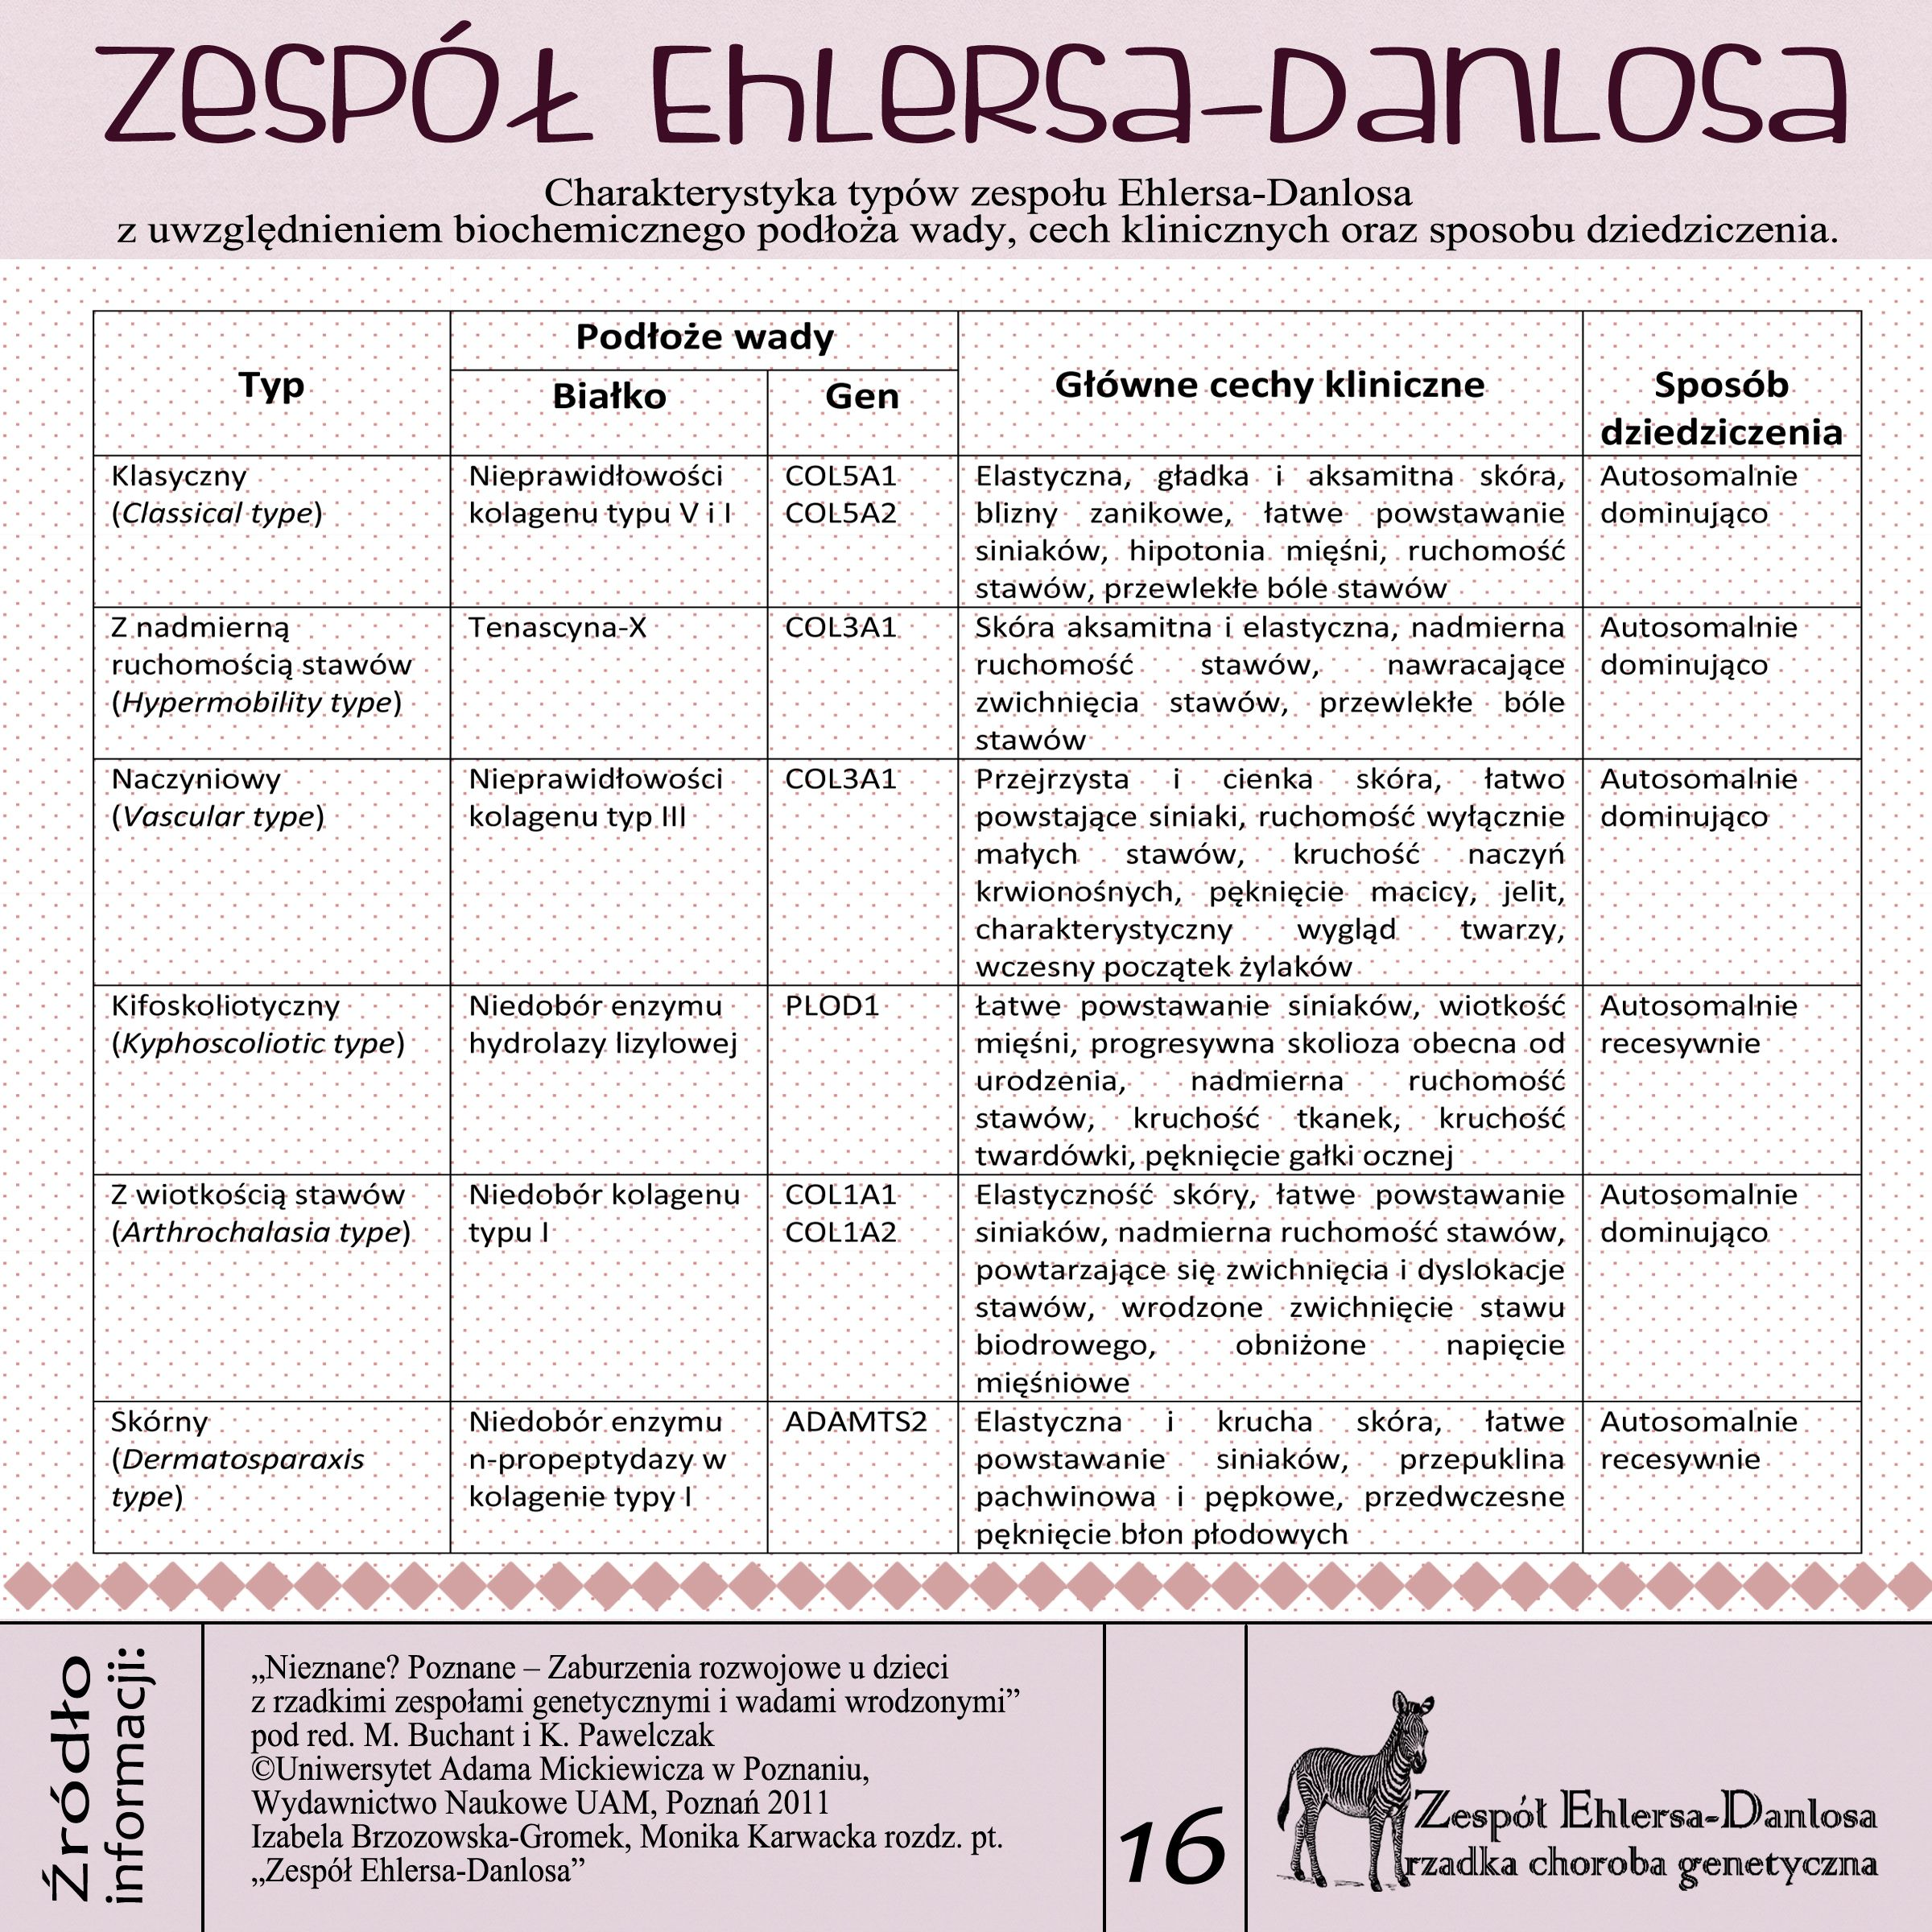 Eds Zespol Ehlersa Danlosa Ehlers Danlos Syndrom With Images